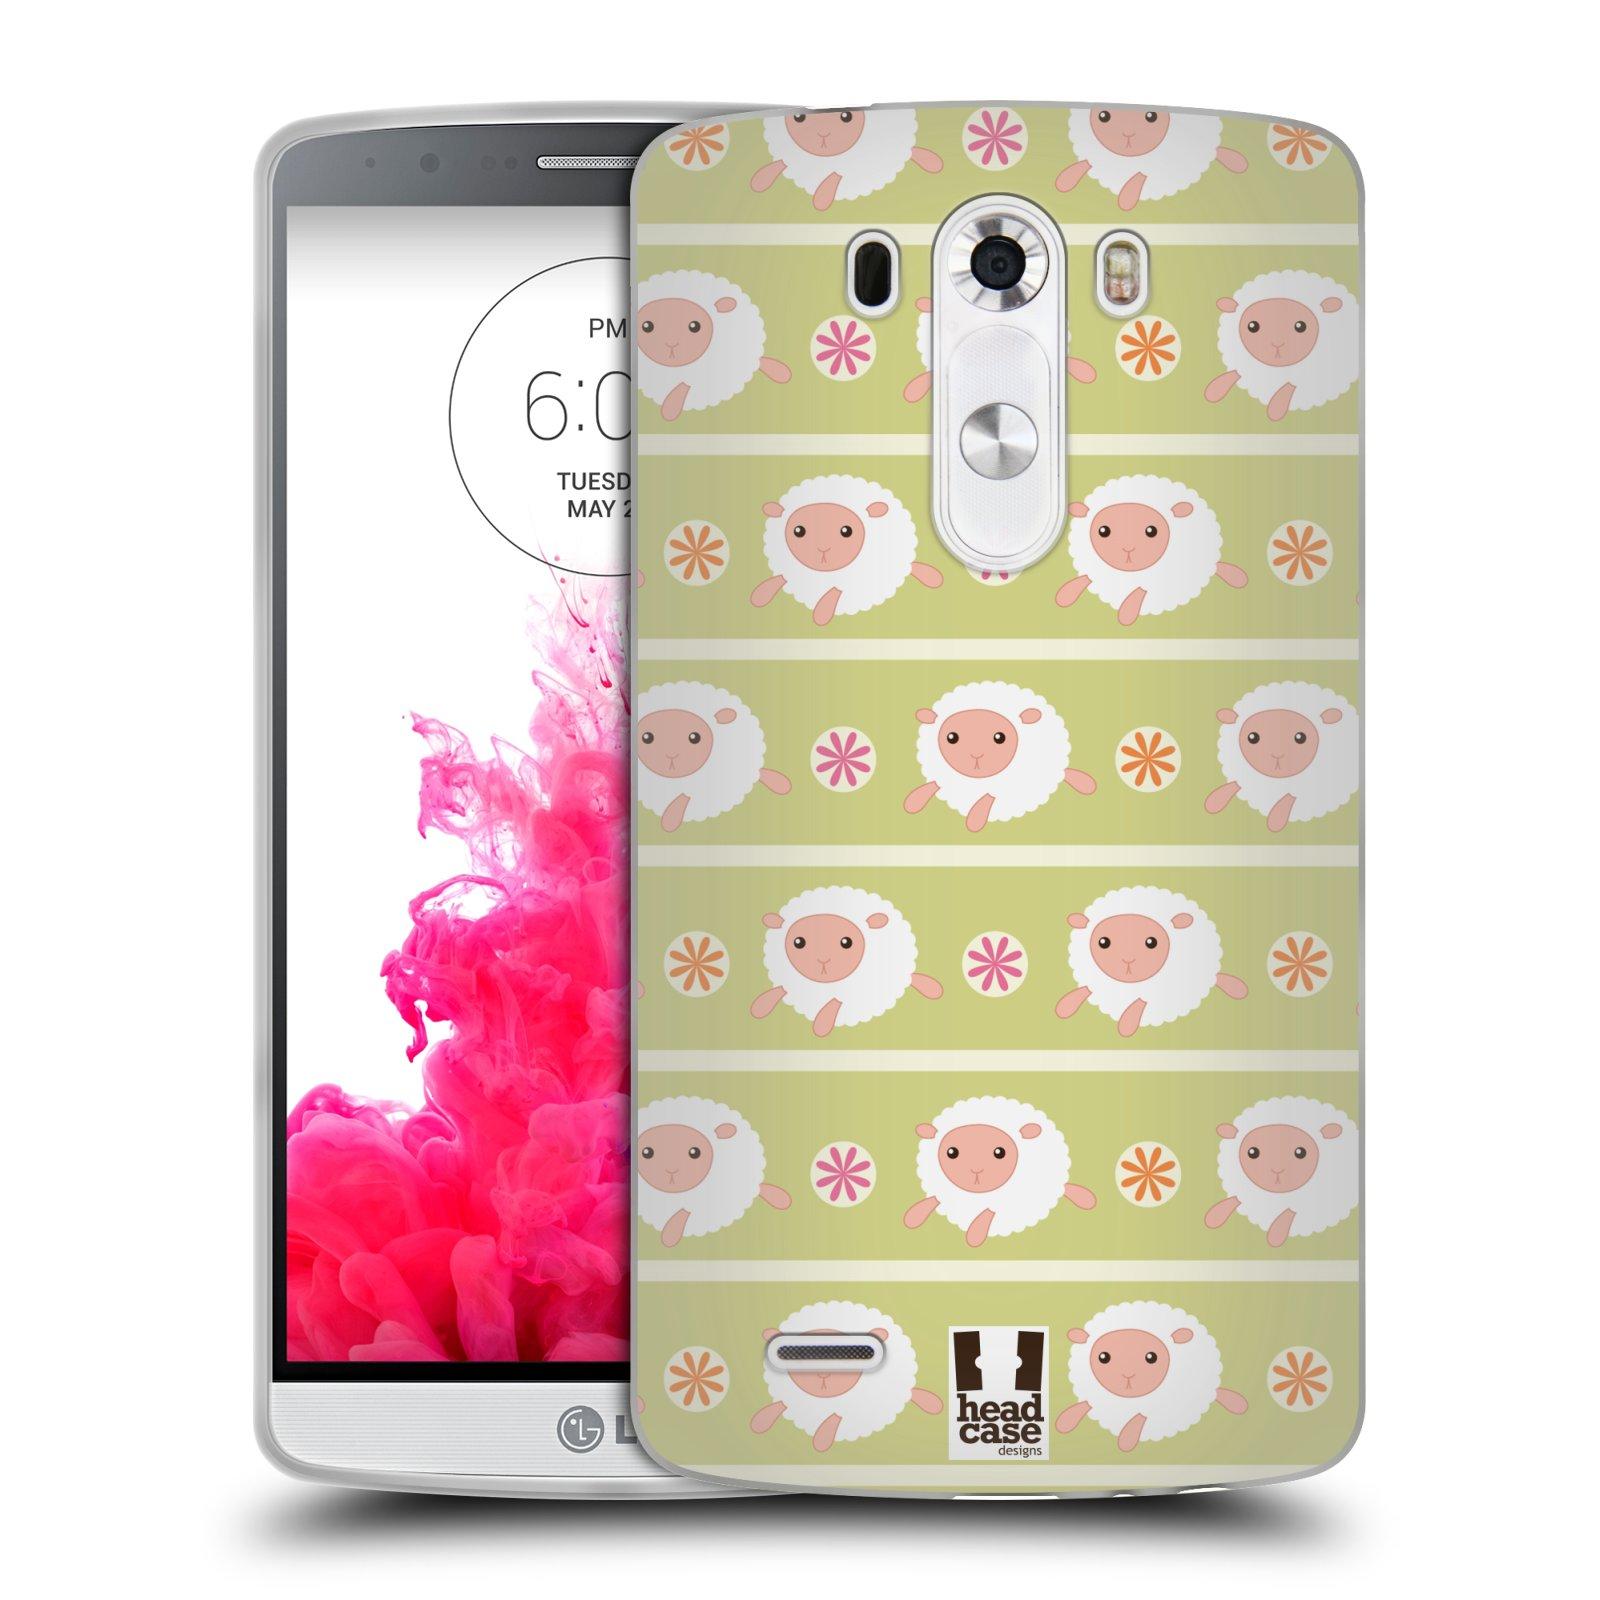 HEAD CASE silikonový obal na mobil LG G3 vzor roztomilé zvířecí vzory ovečky